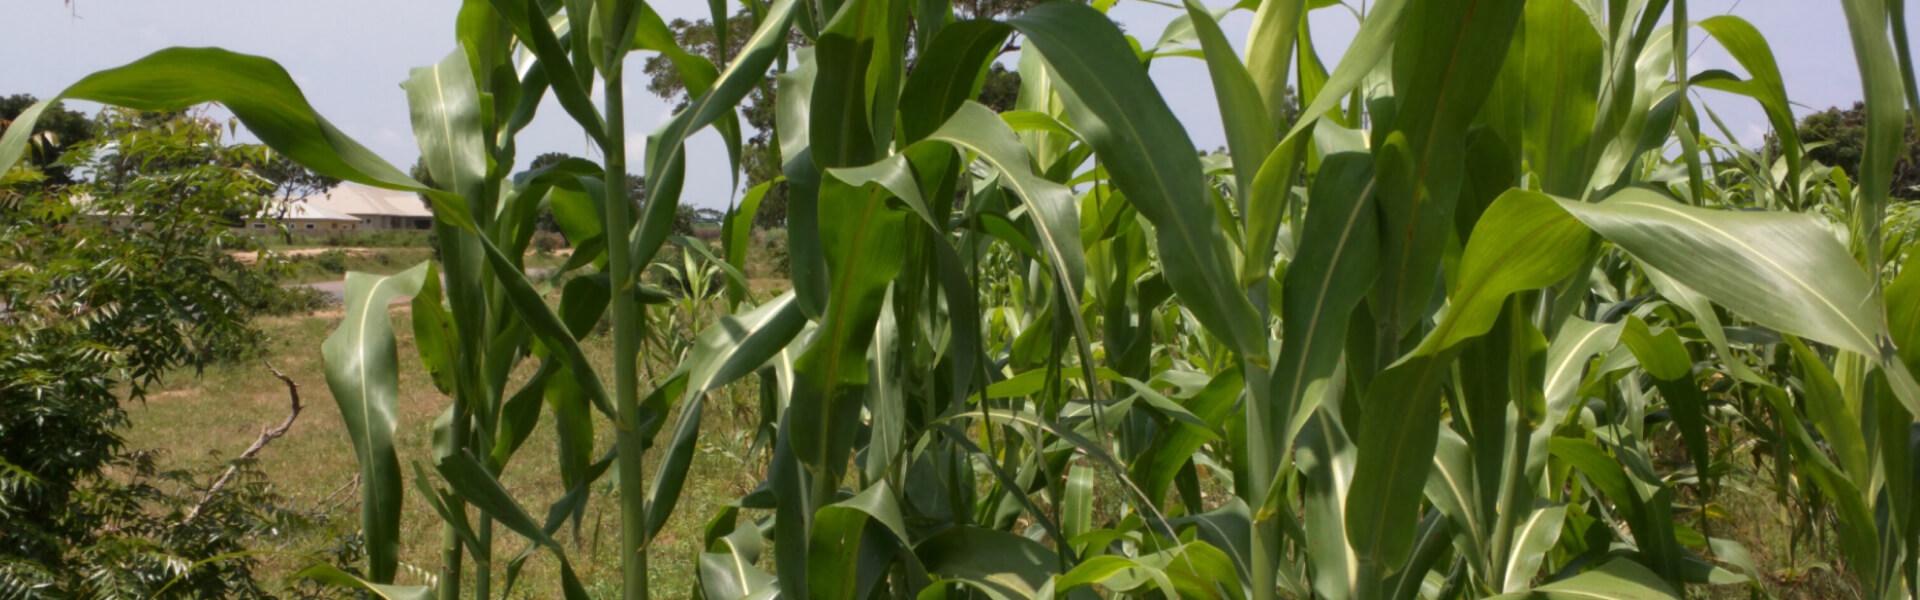 africa-corn